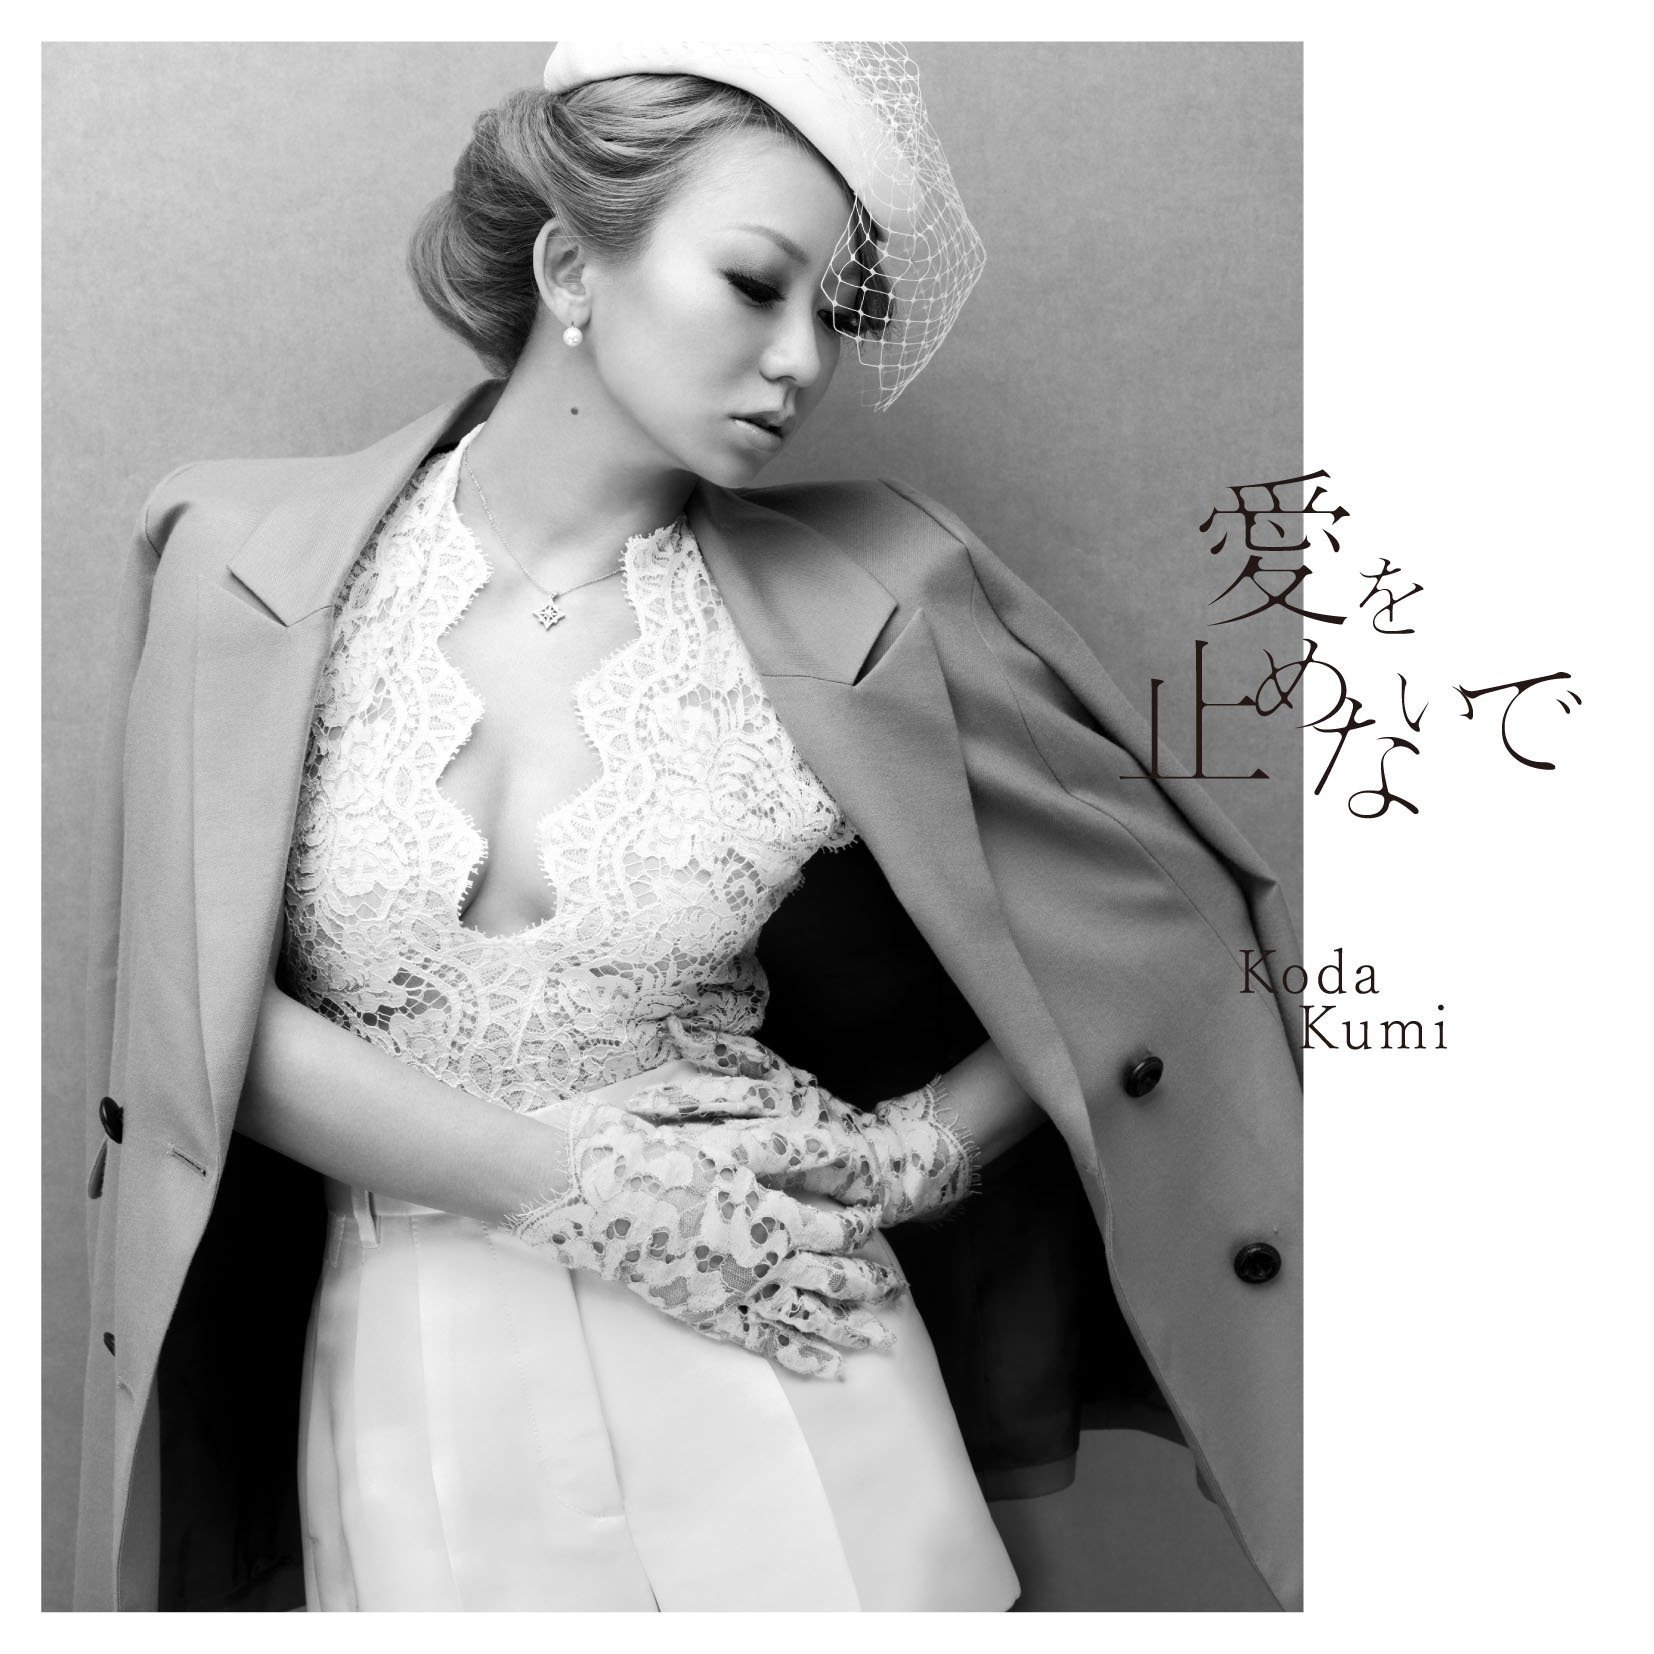 20190314.0218.05 Koda Kumi - Ai wo Tomenaide (DVD) cover 1.jpg